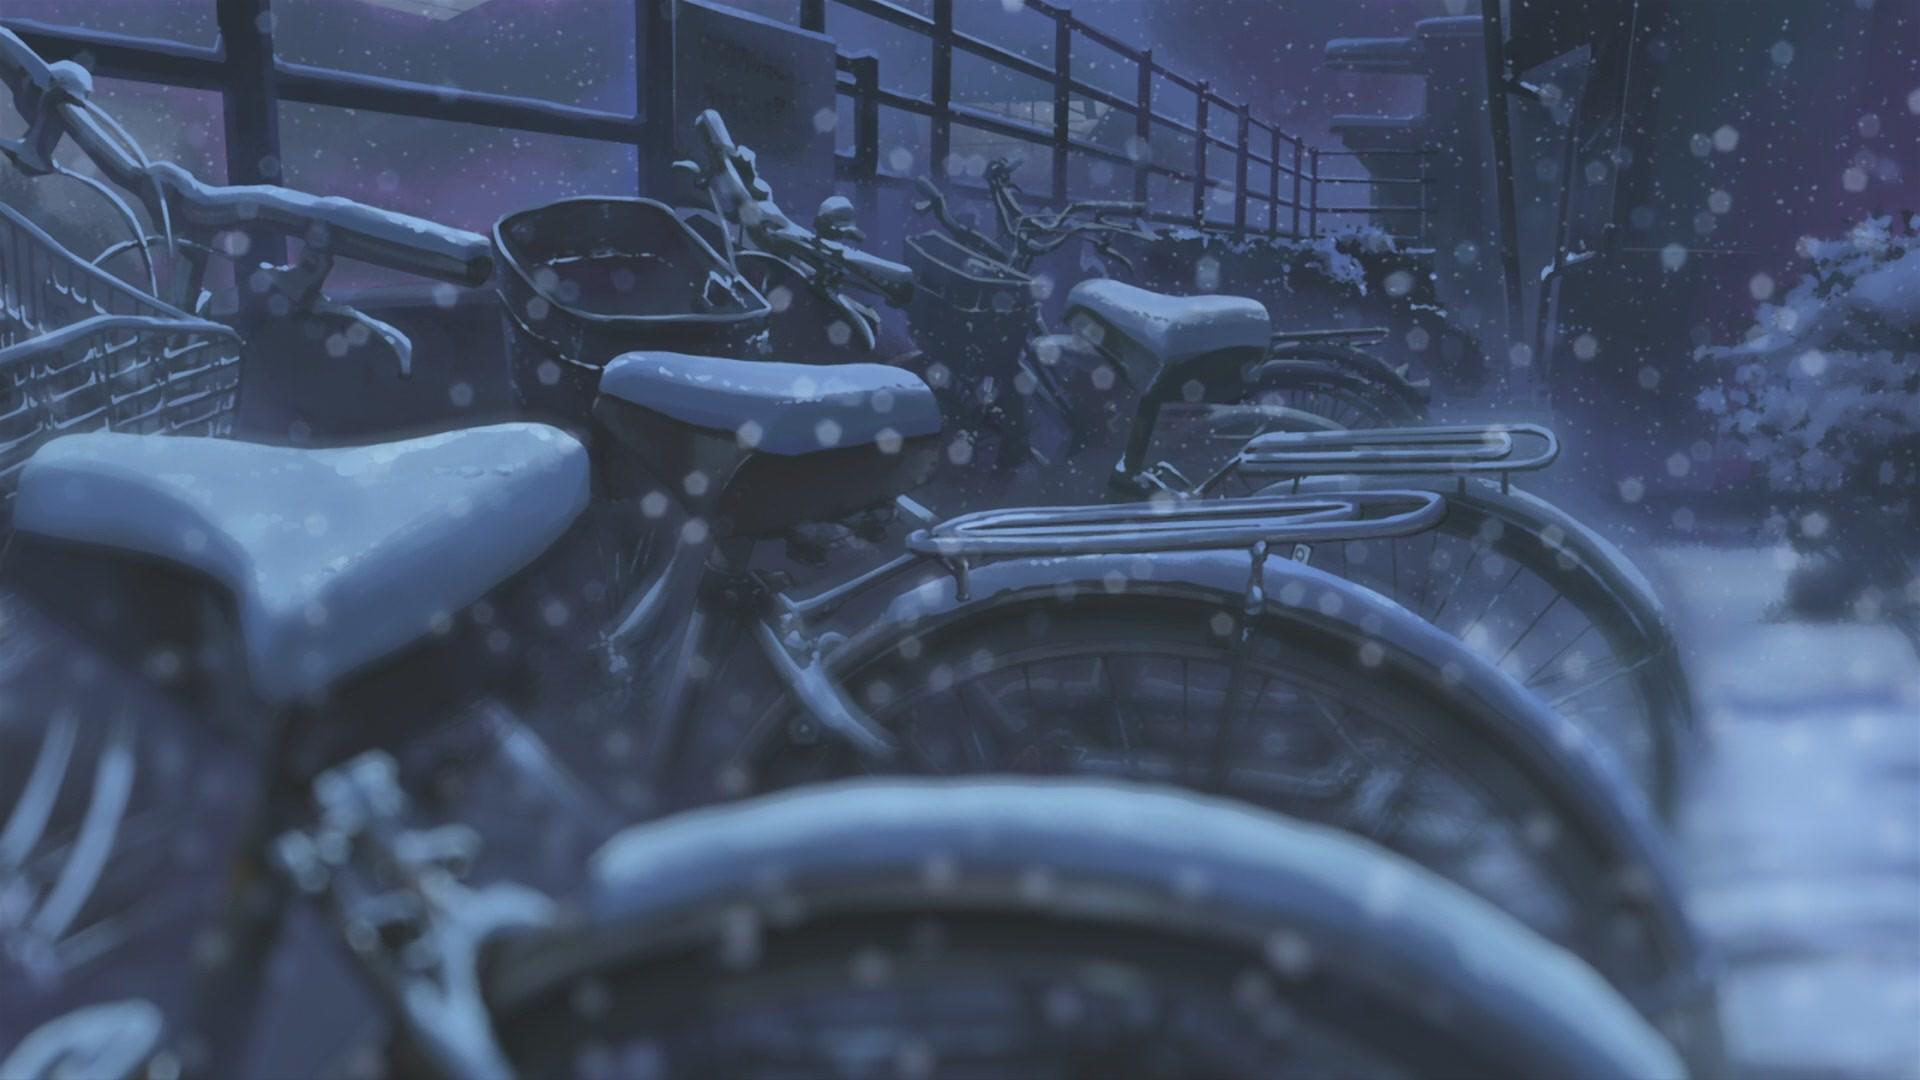 Wallpaper Snow Winter Vehicle Manga 5 Centimeters Per Second